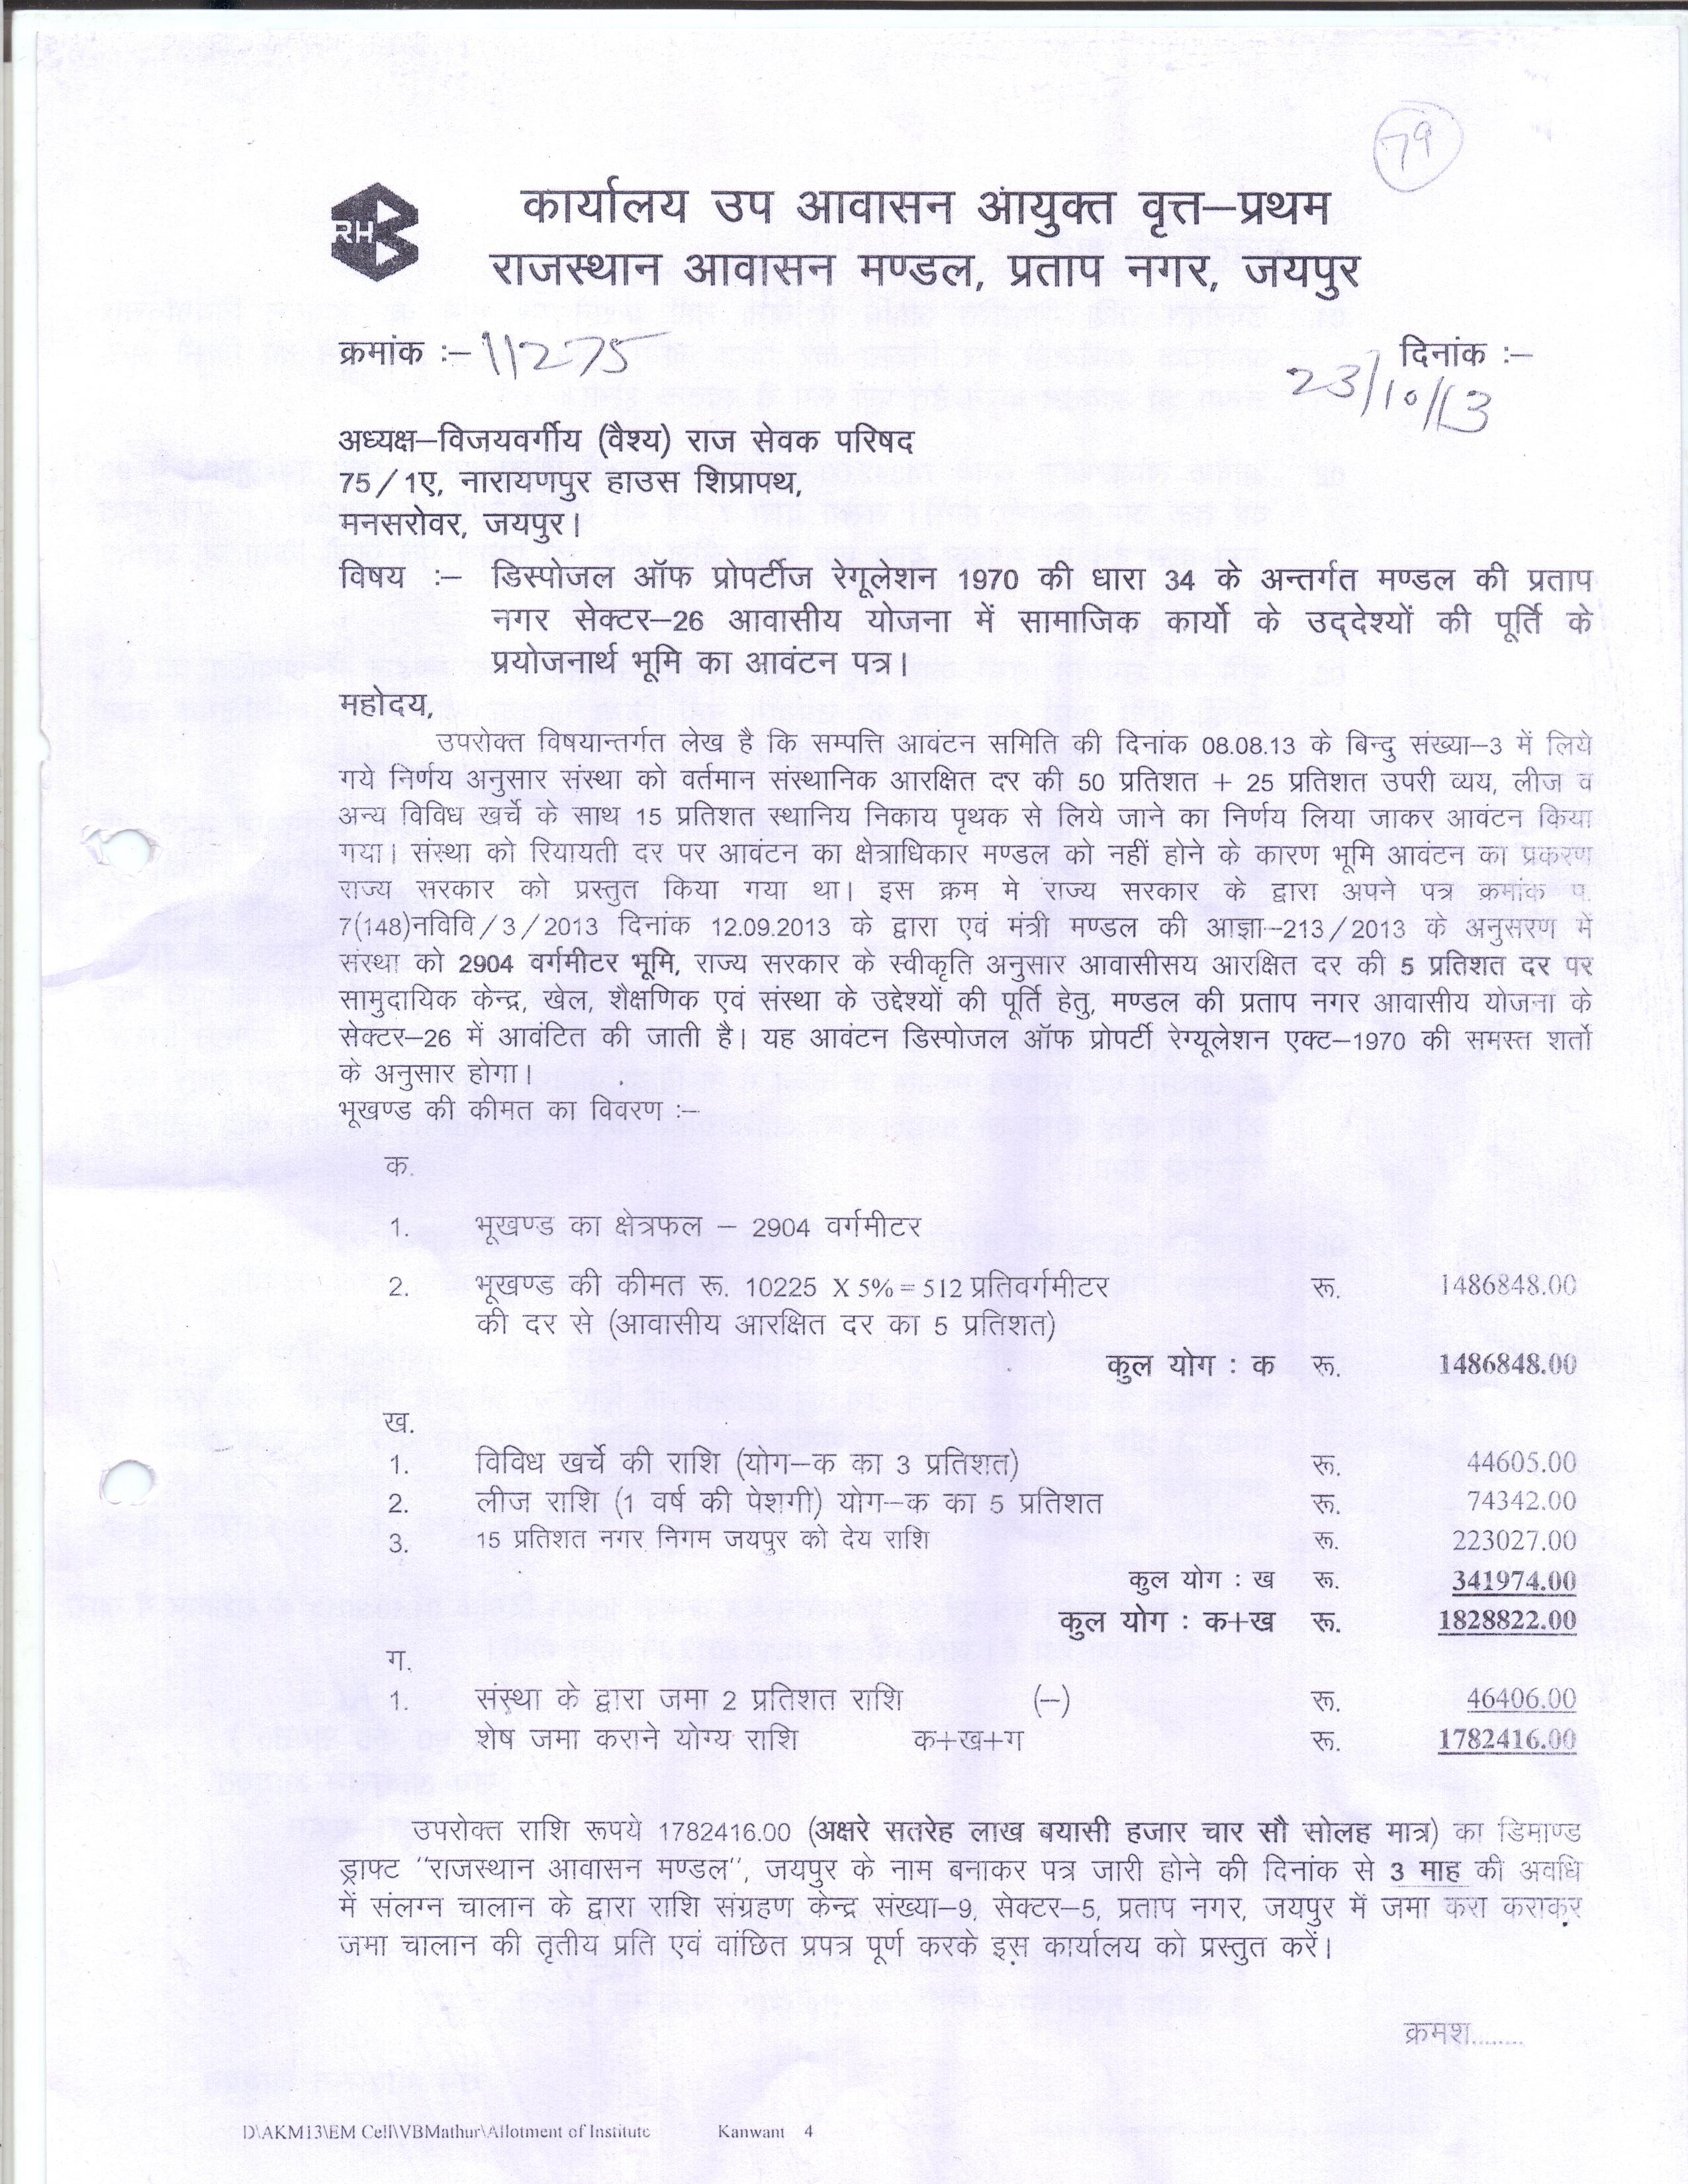 Demand letter 23-10-13 -Fornt